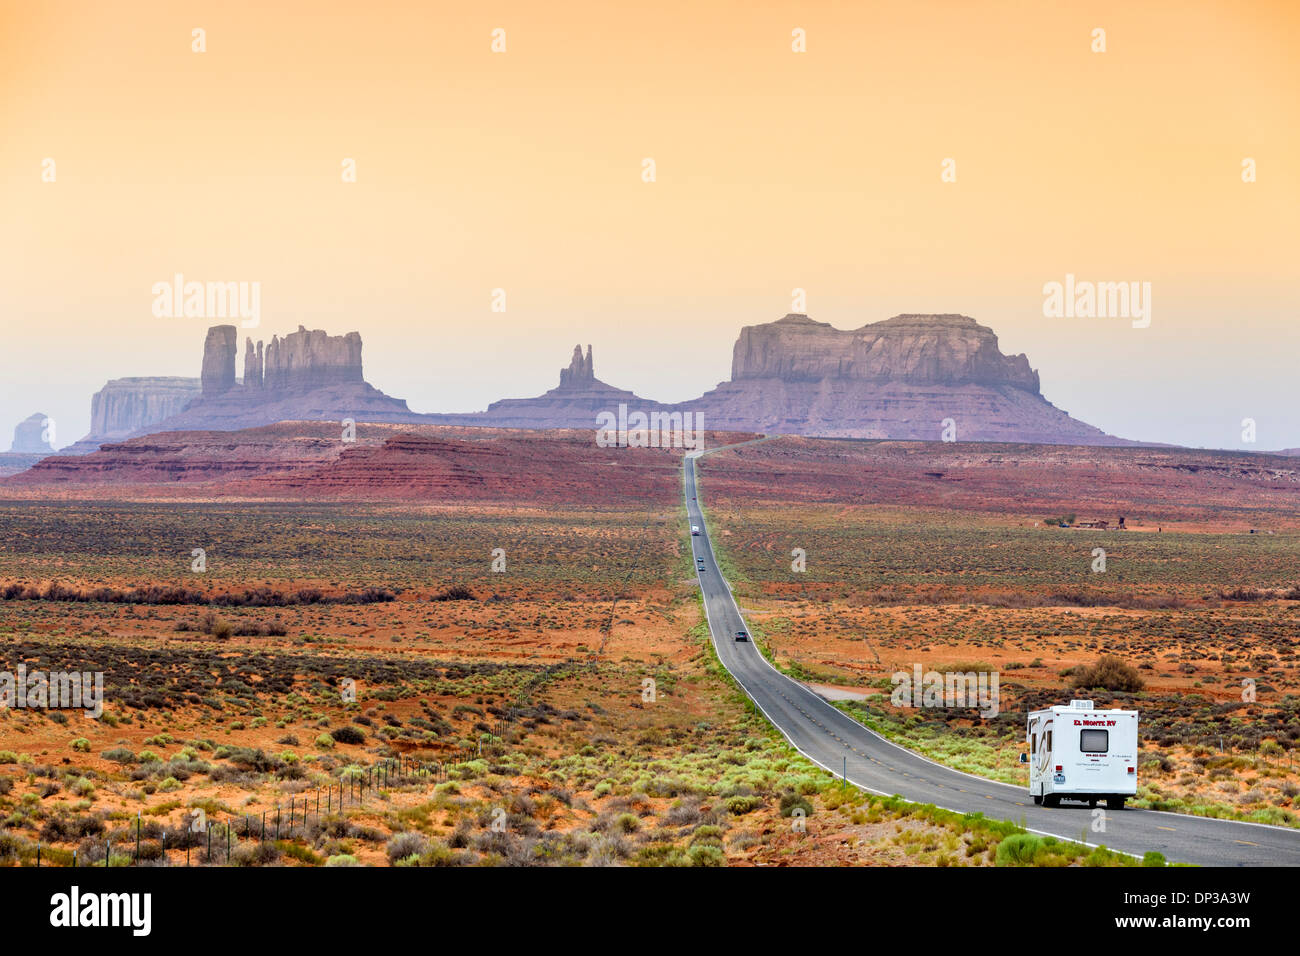 USA Travel. Camping-van (camping) sur nous à la 163 sud en direction de Monument Valley, Utah, United States of America Photo Stock